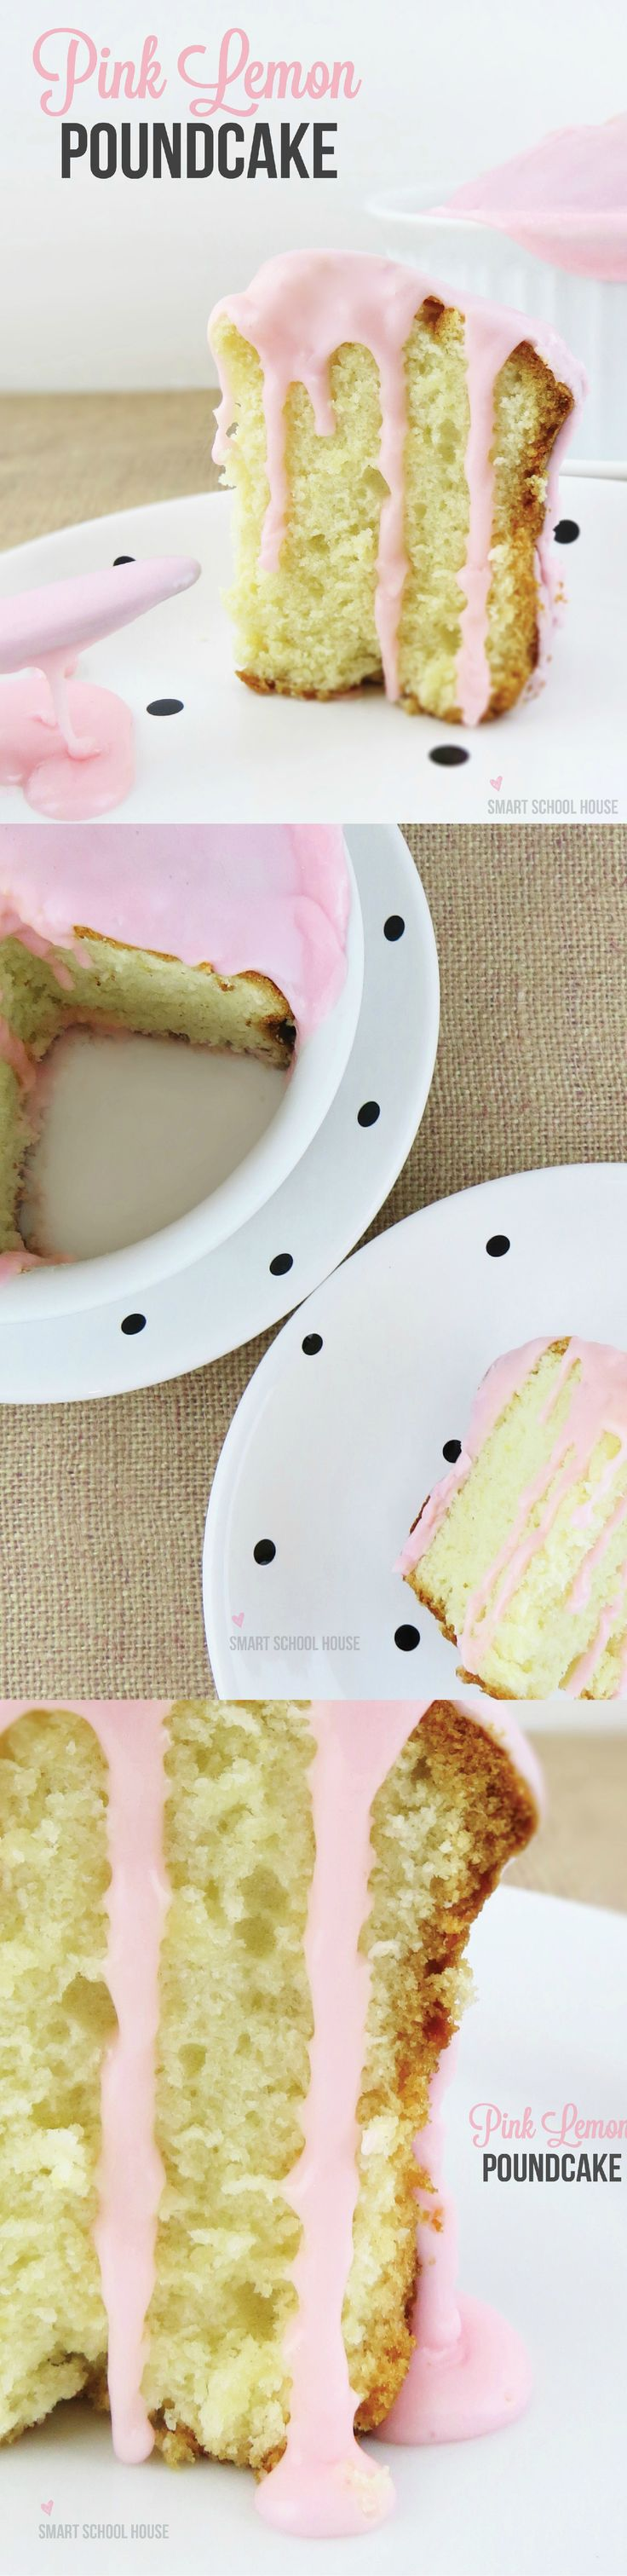 I love this pretty homemade pound cake recipe! Could make a cute Valentine's day dessert.